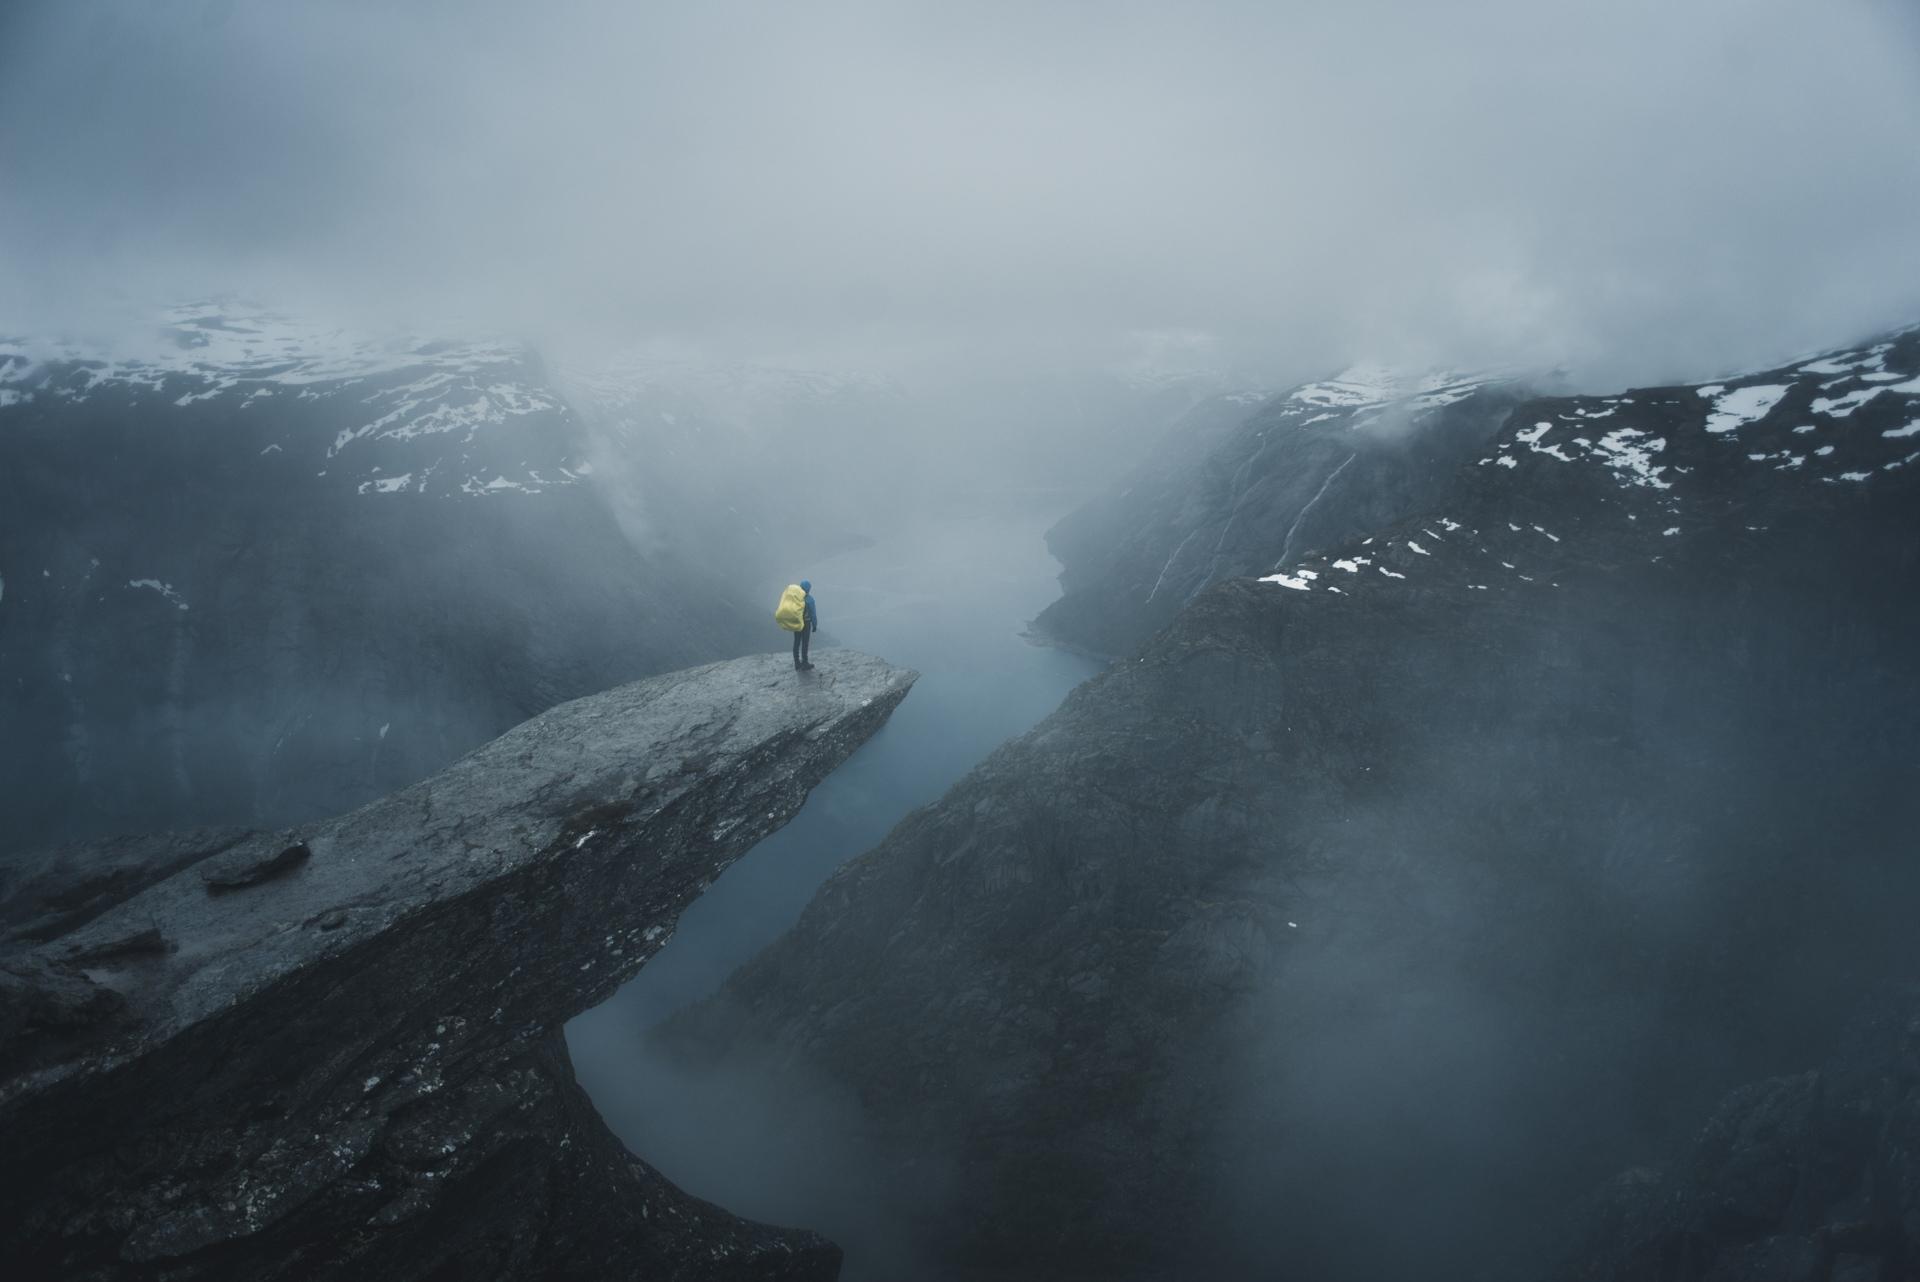 Роскошные пейзажи Норвегии - Страница 4 LXv-7ZtFdzo